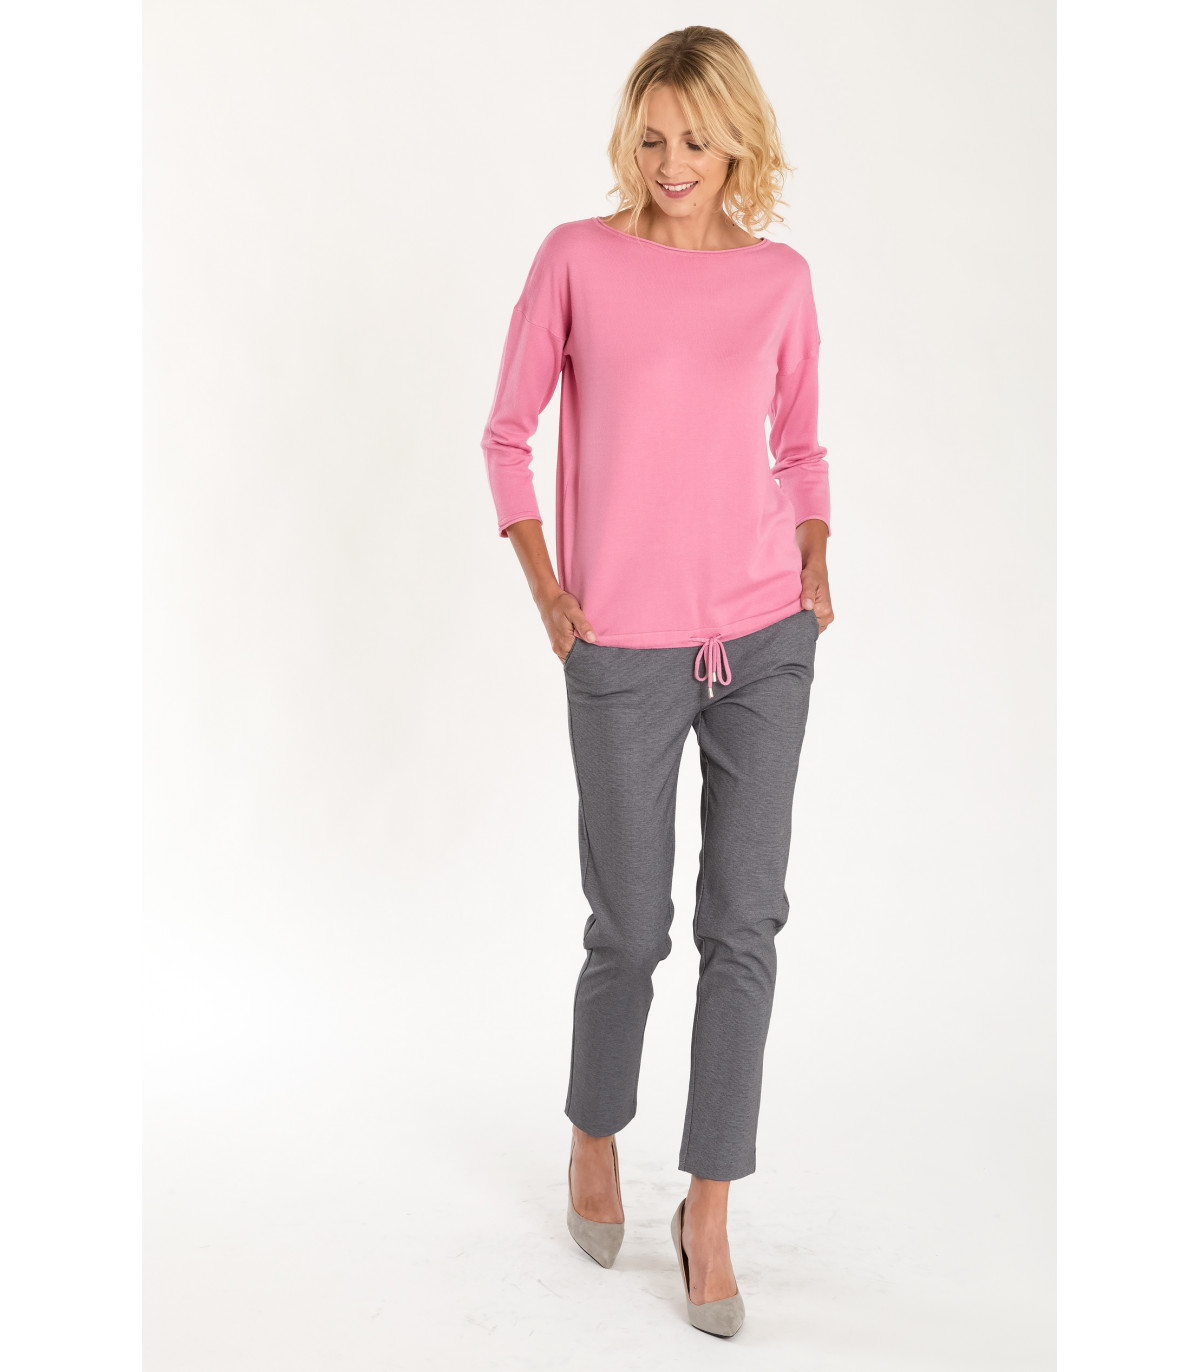 9777b97f Eleganckie szare spodnie z podniesionym stanem Rozmiar 44 Kolor B18CHE10